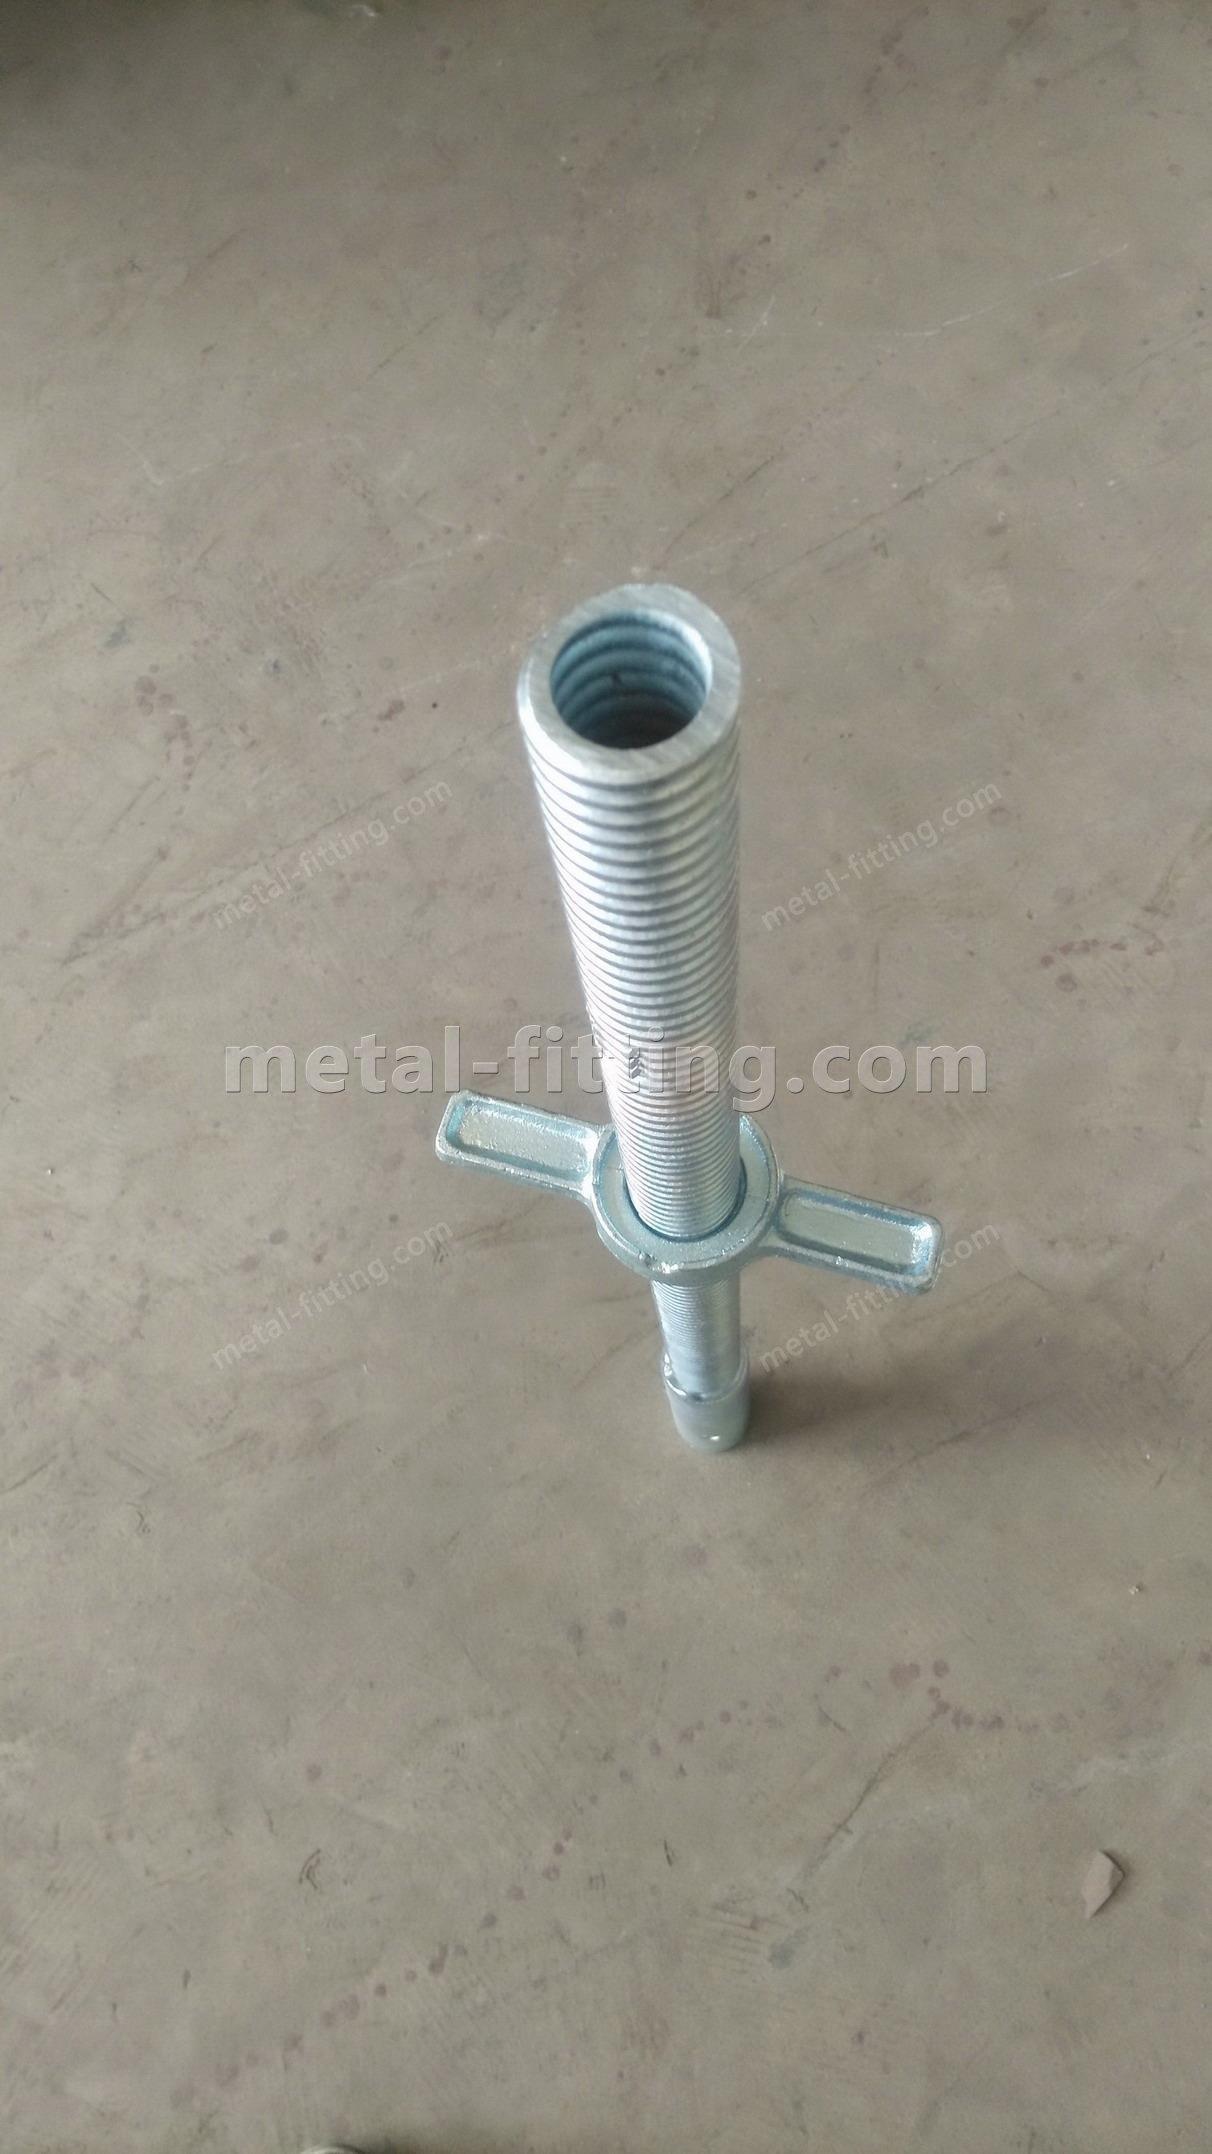 scaffolding standards jack base,scaffolding,scaffold part-scaffolding base